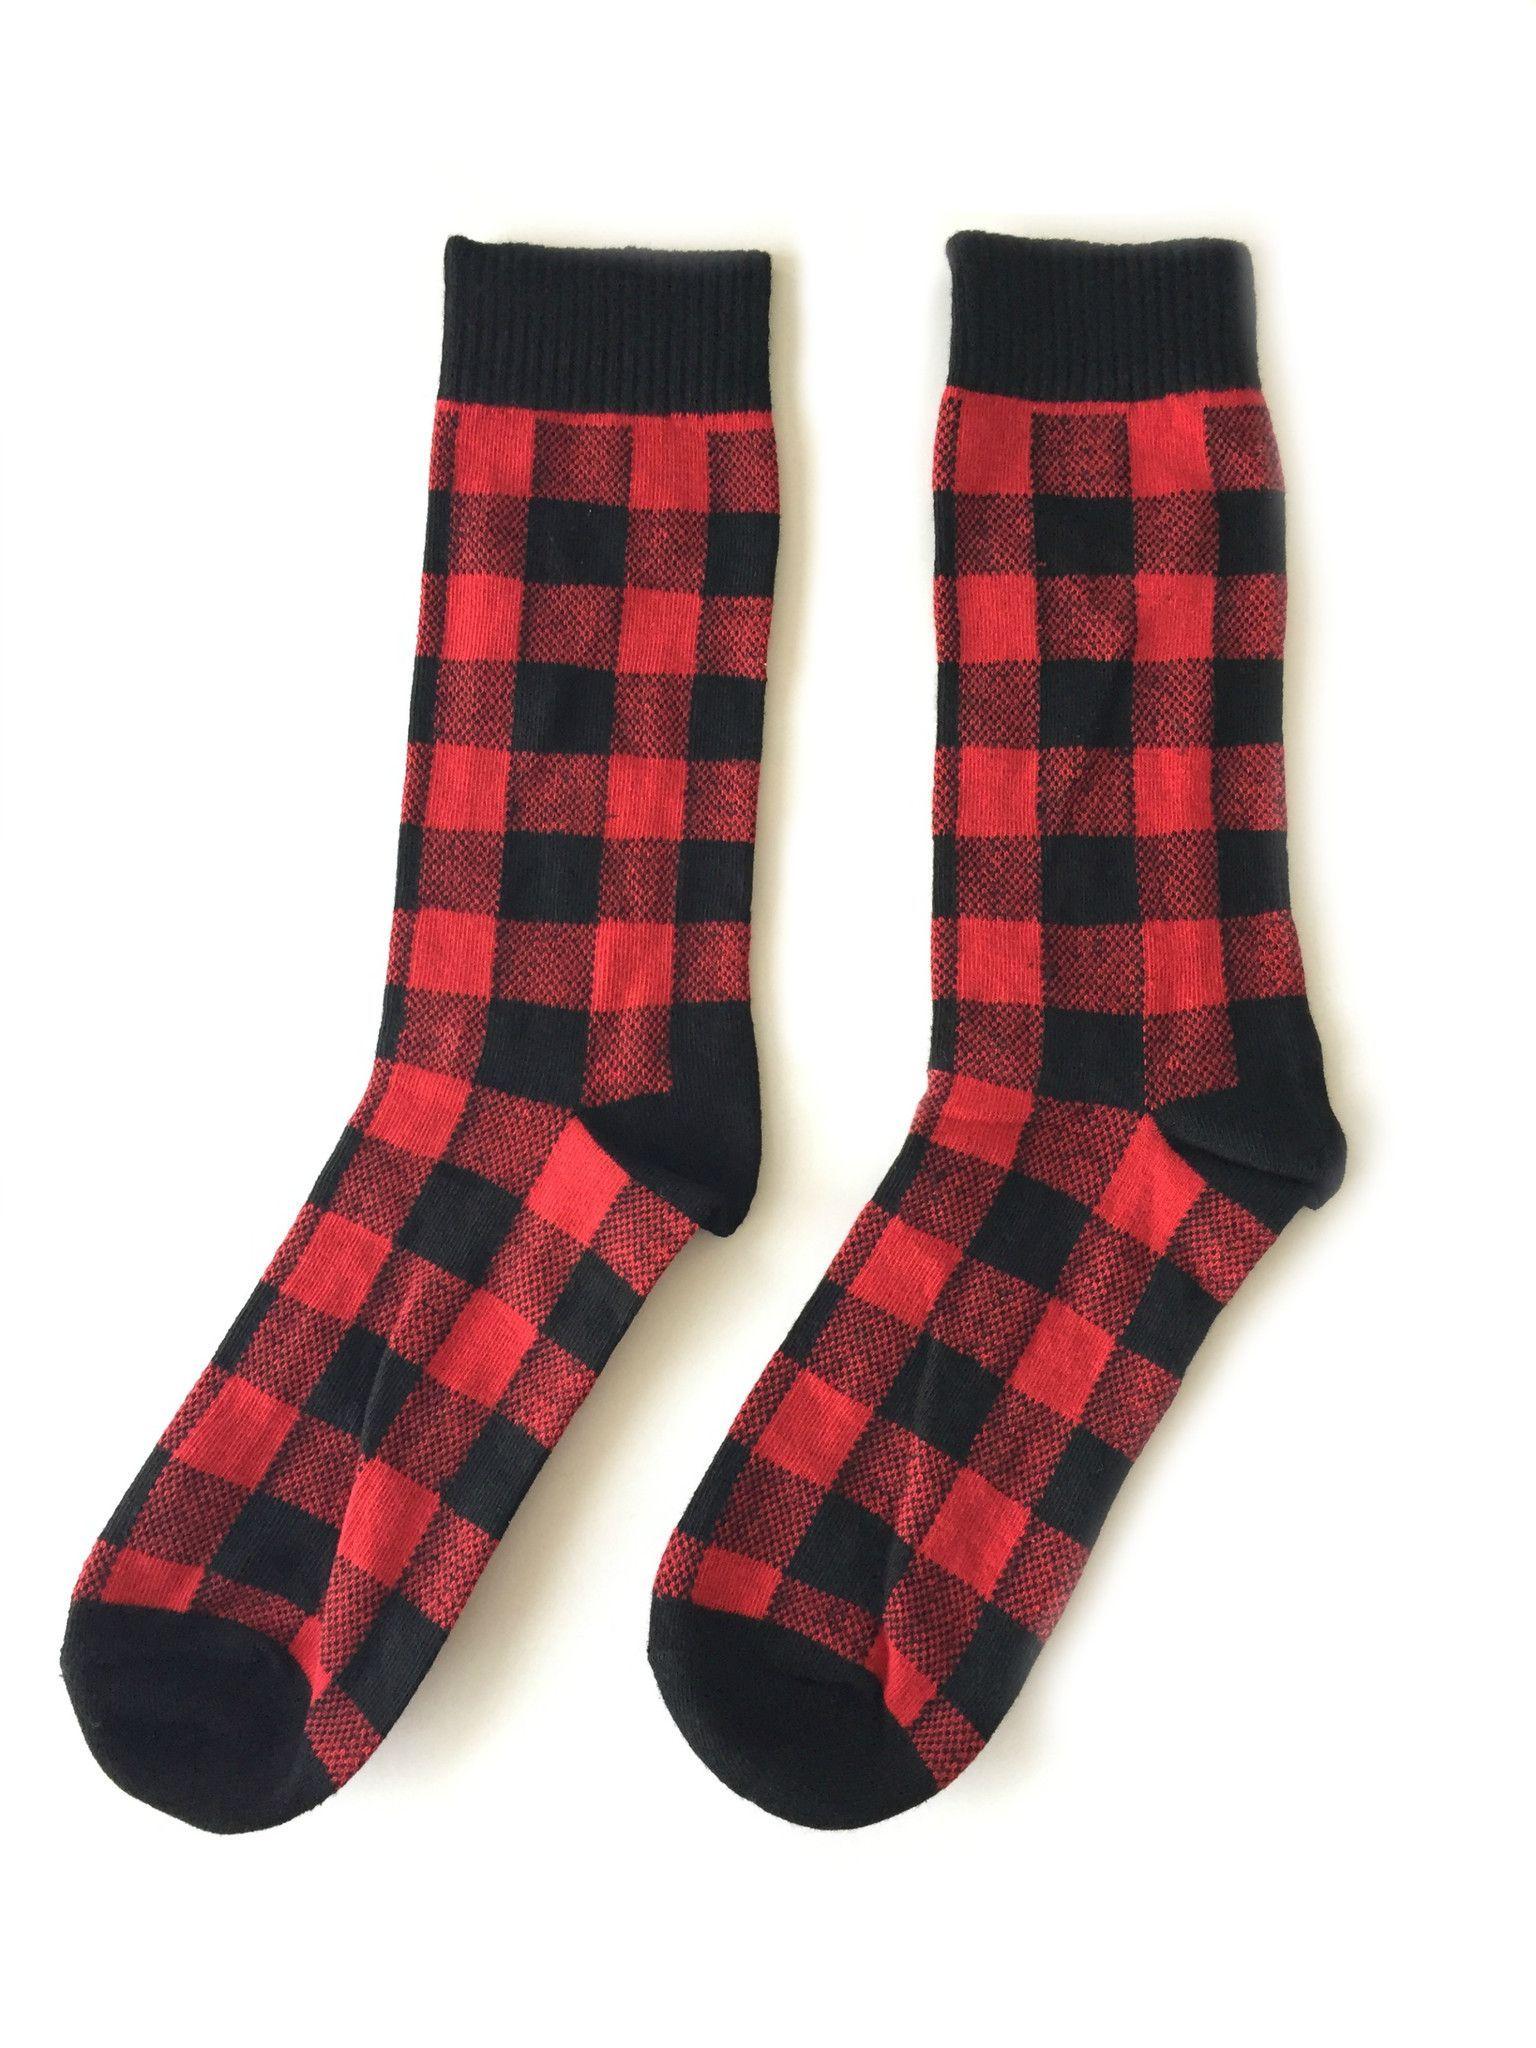 Men S And Women S Buffalo Plaid Socks Women S Buffalo Plaid Red And Black Outfits Plaid